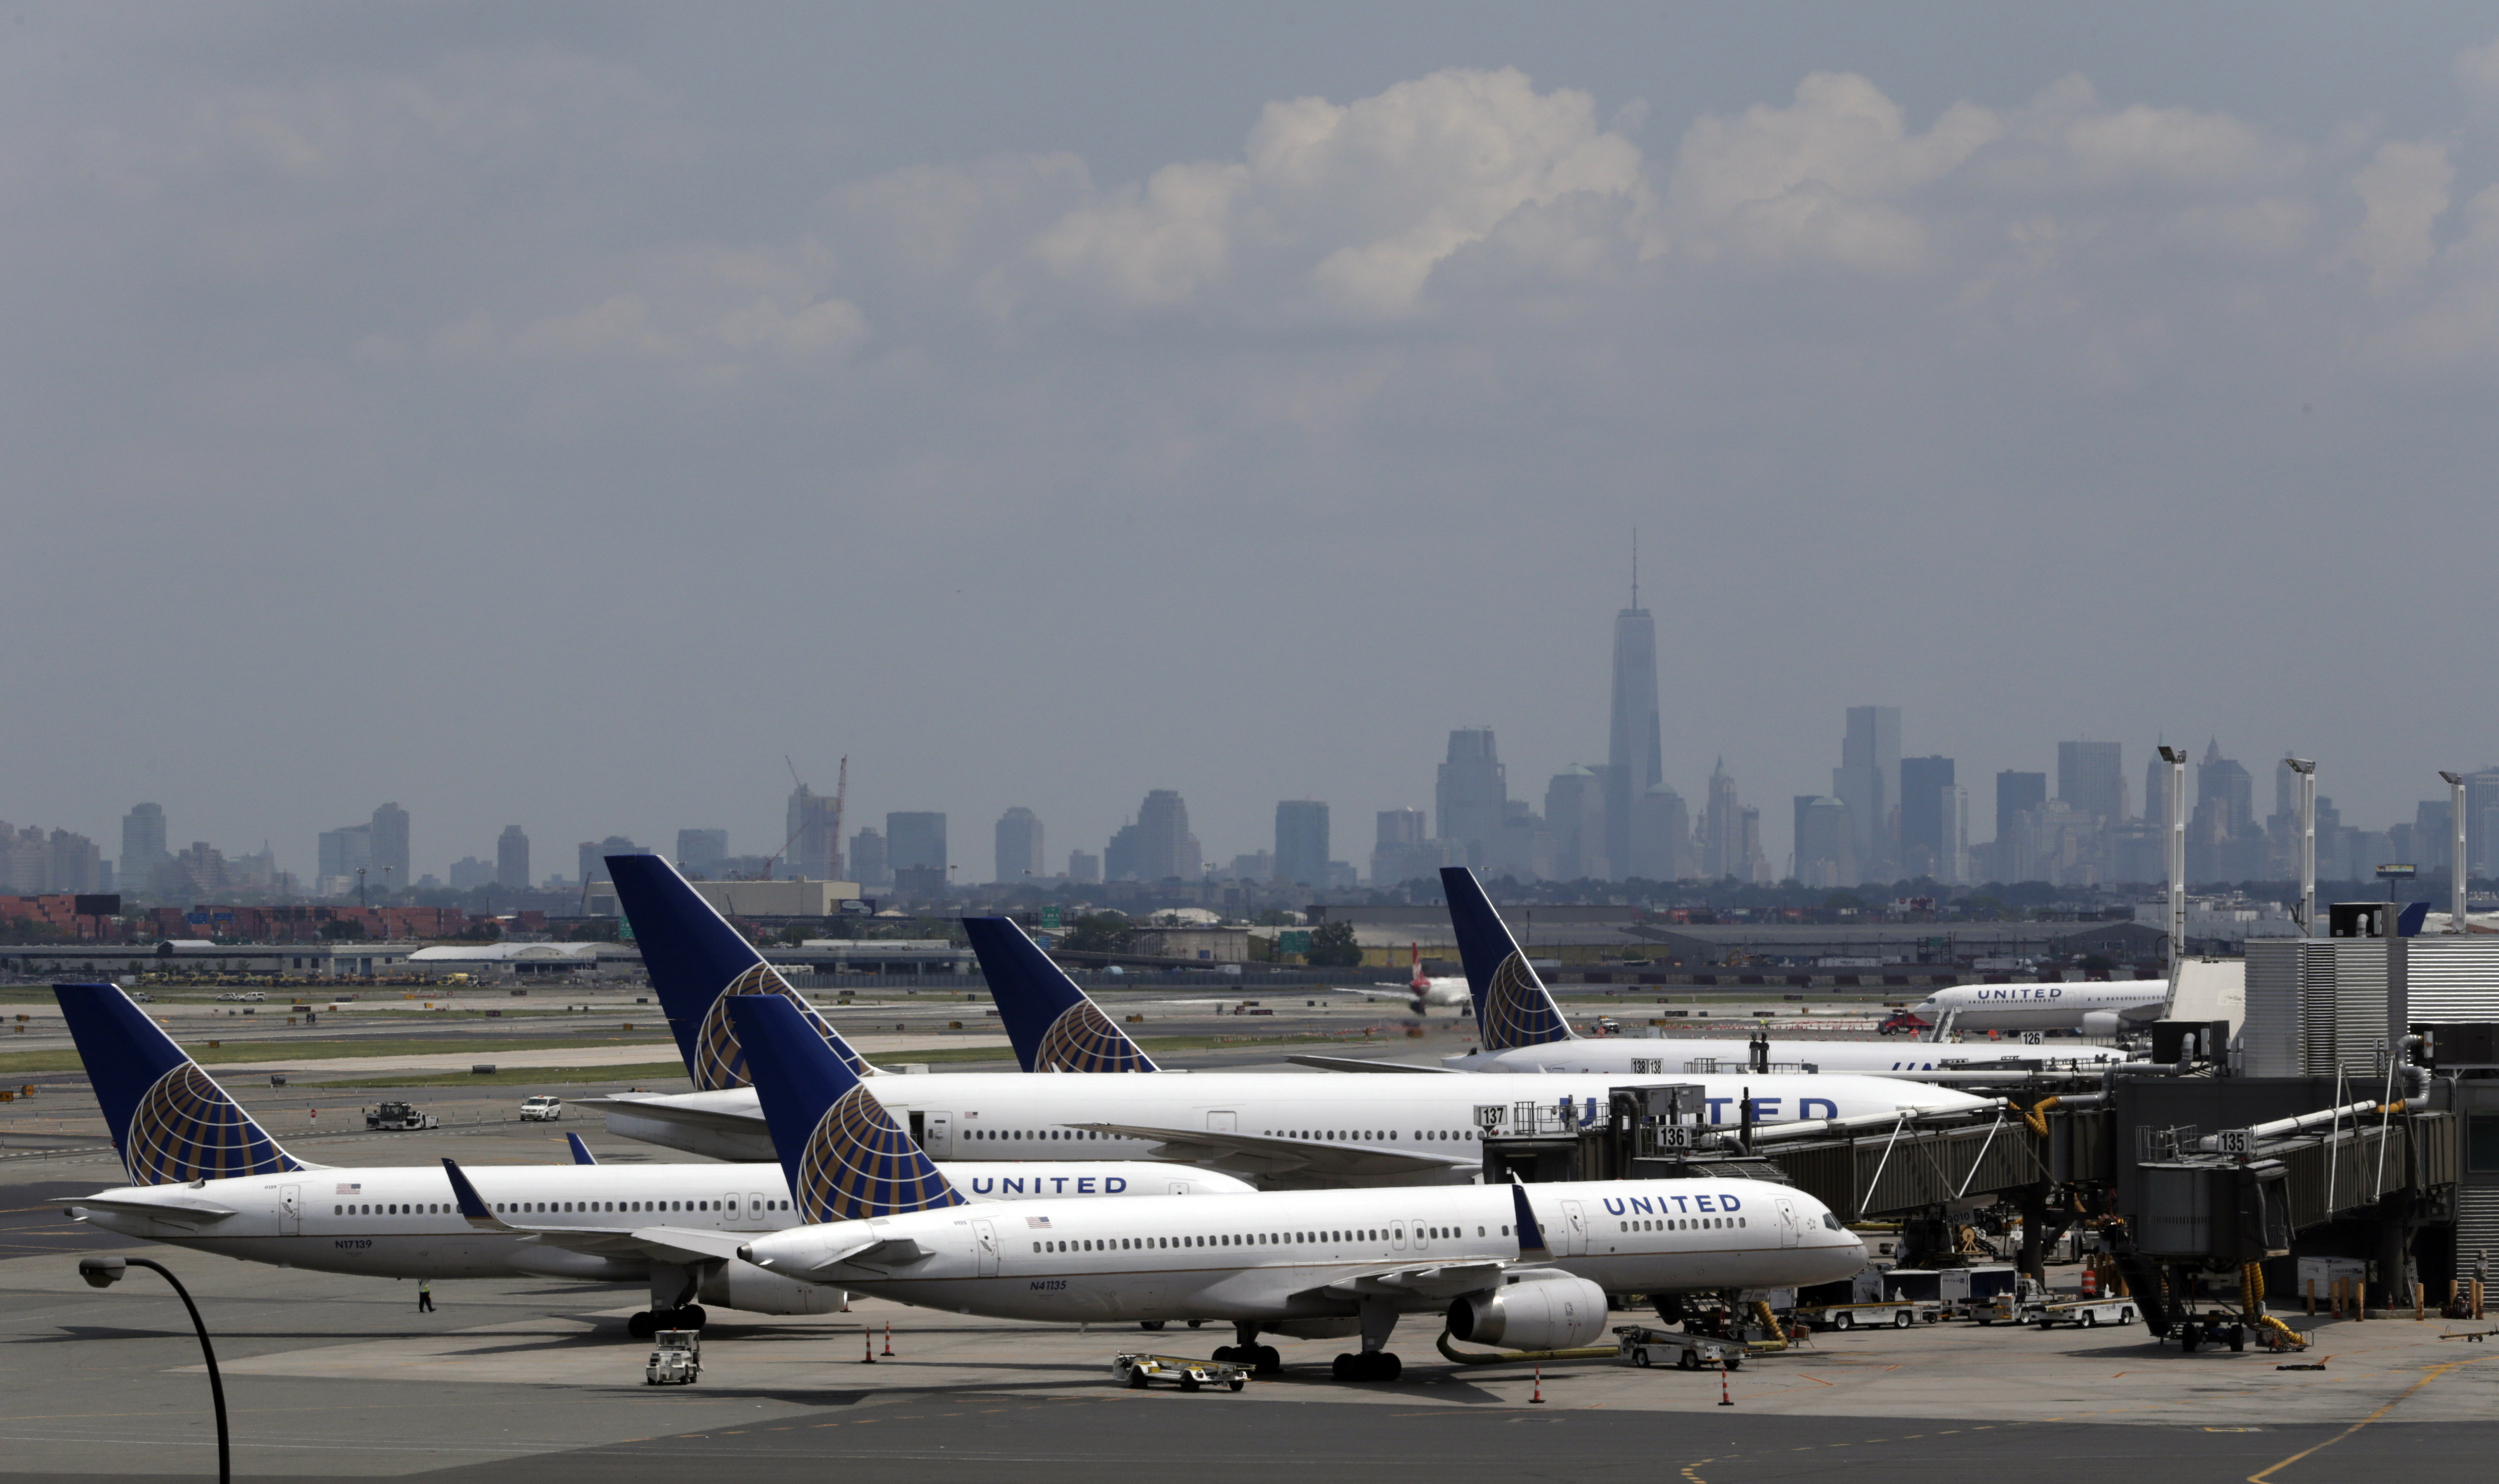 Aeroporto York : Flight diverted when passengers feud over reclining seat aspen